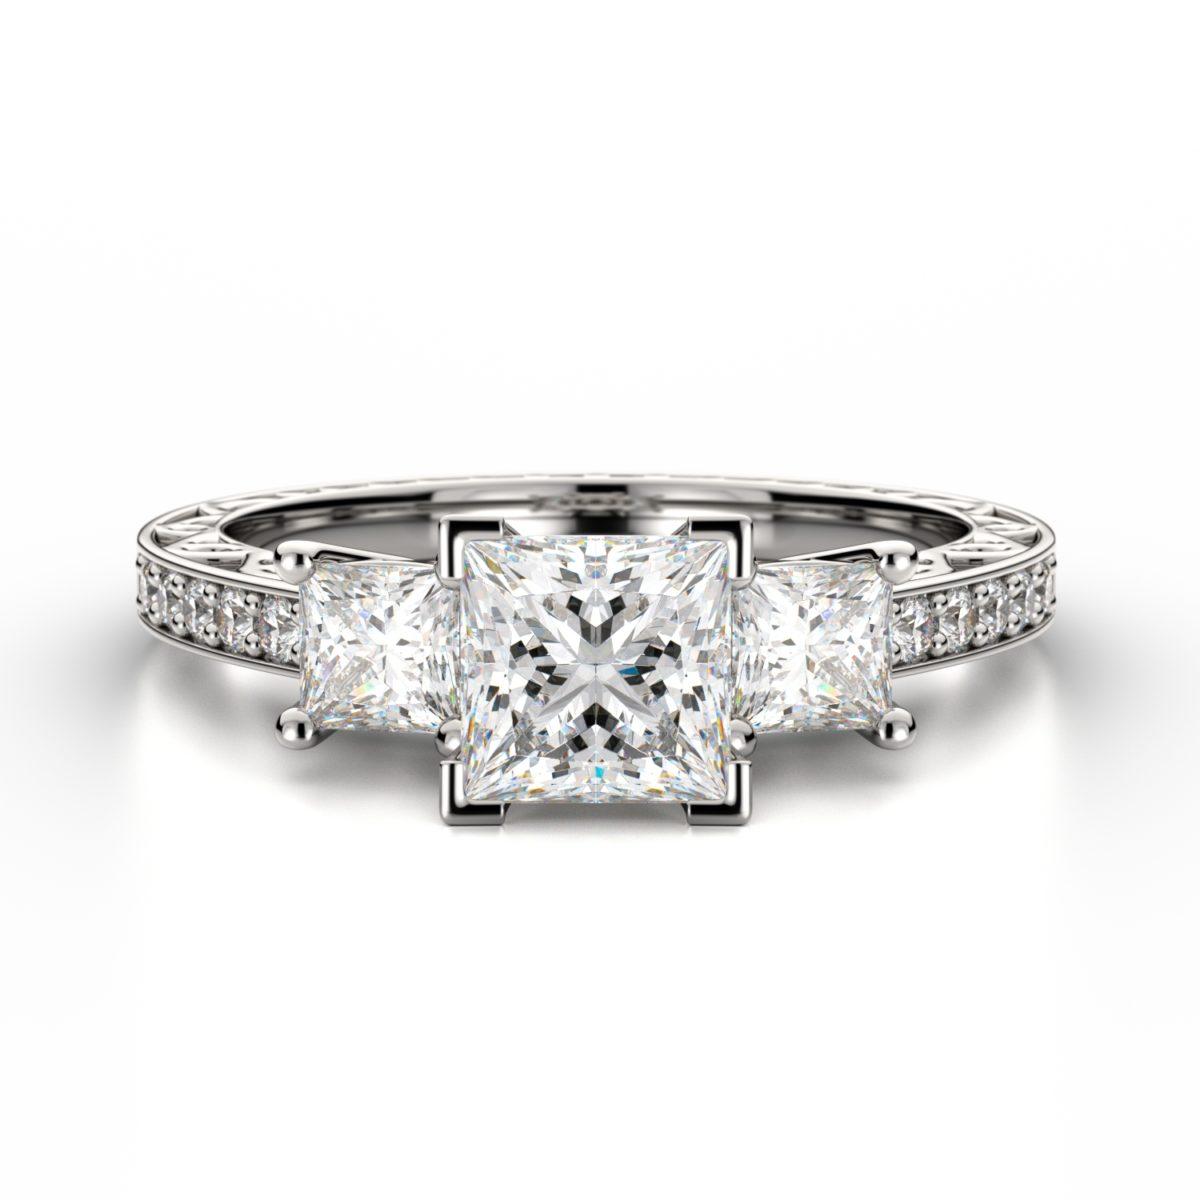 Engagement Rings Newcastle: Three Diamond Princess Ring With Sidestones